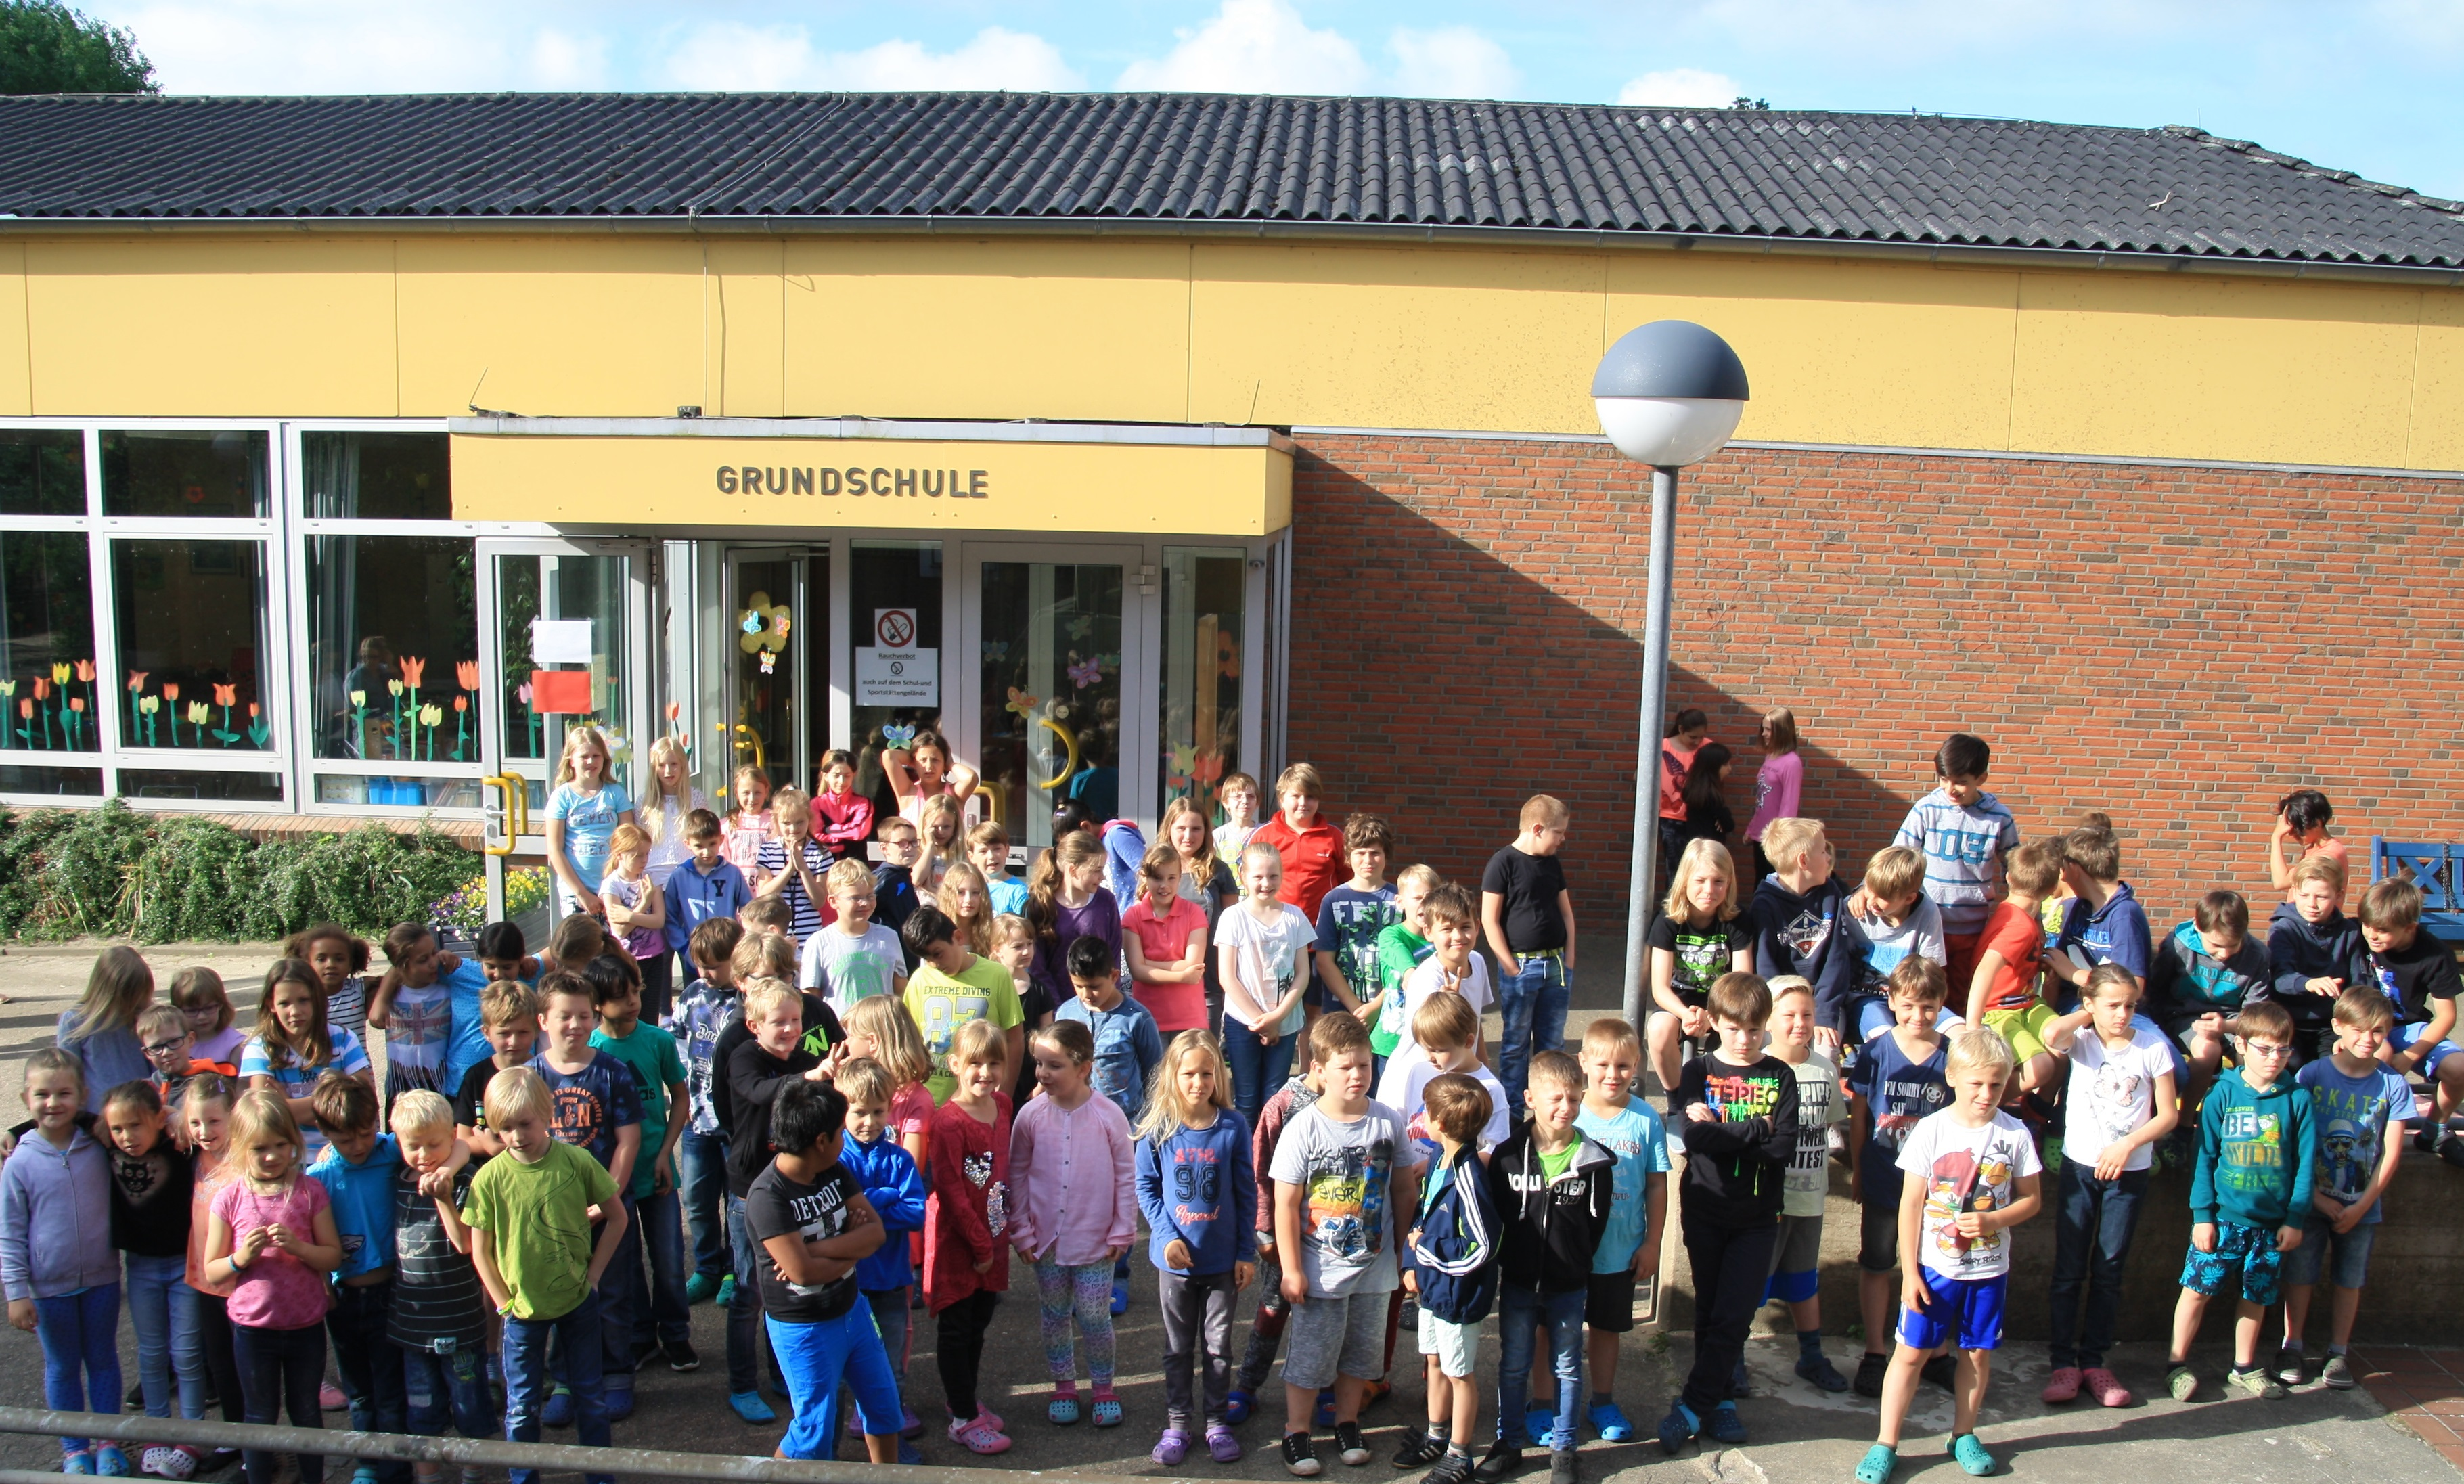 Grundschule Cadenberge